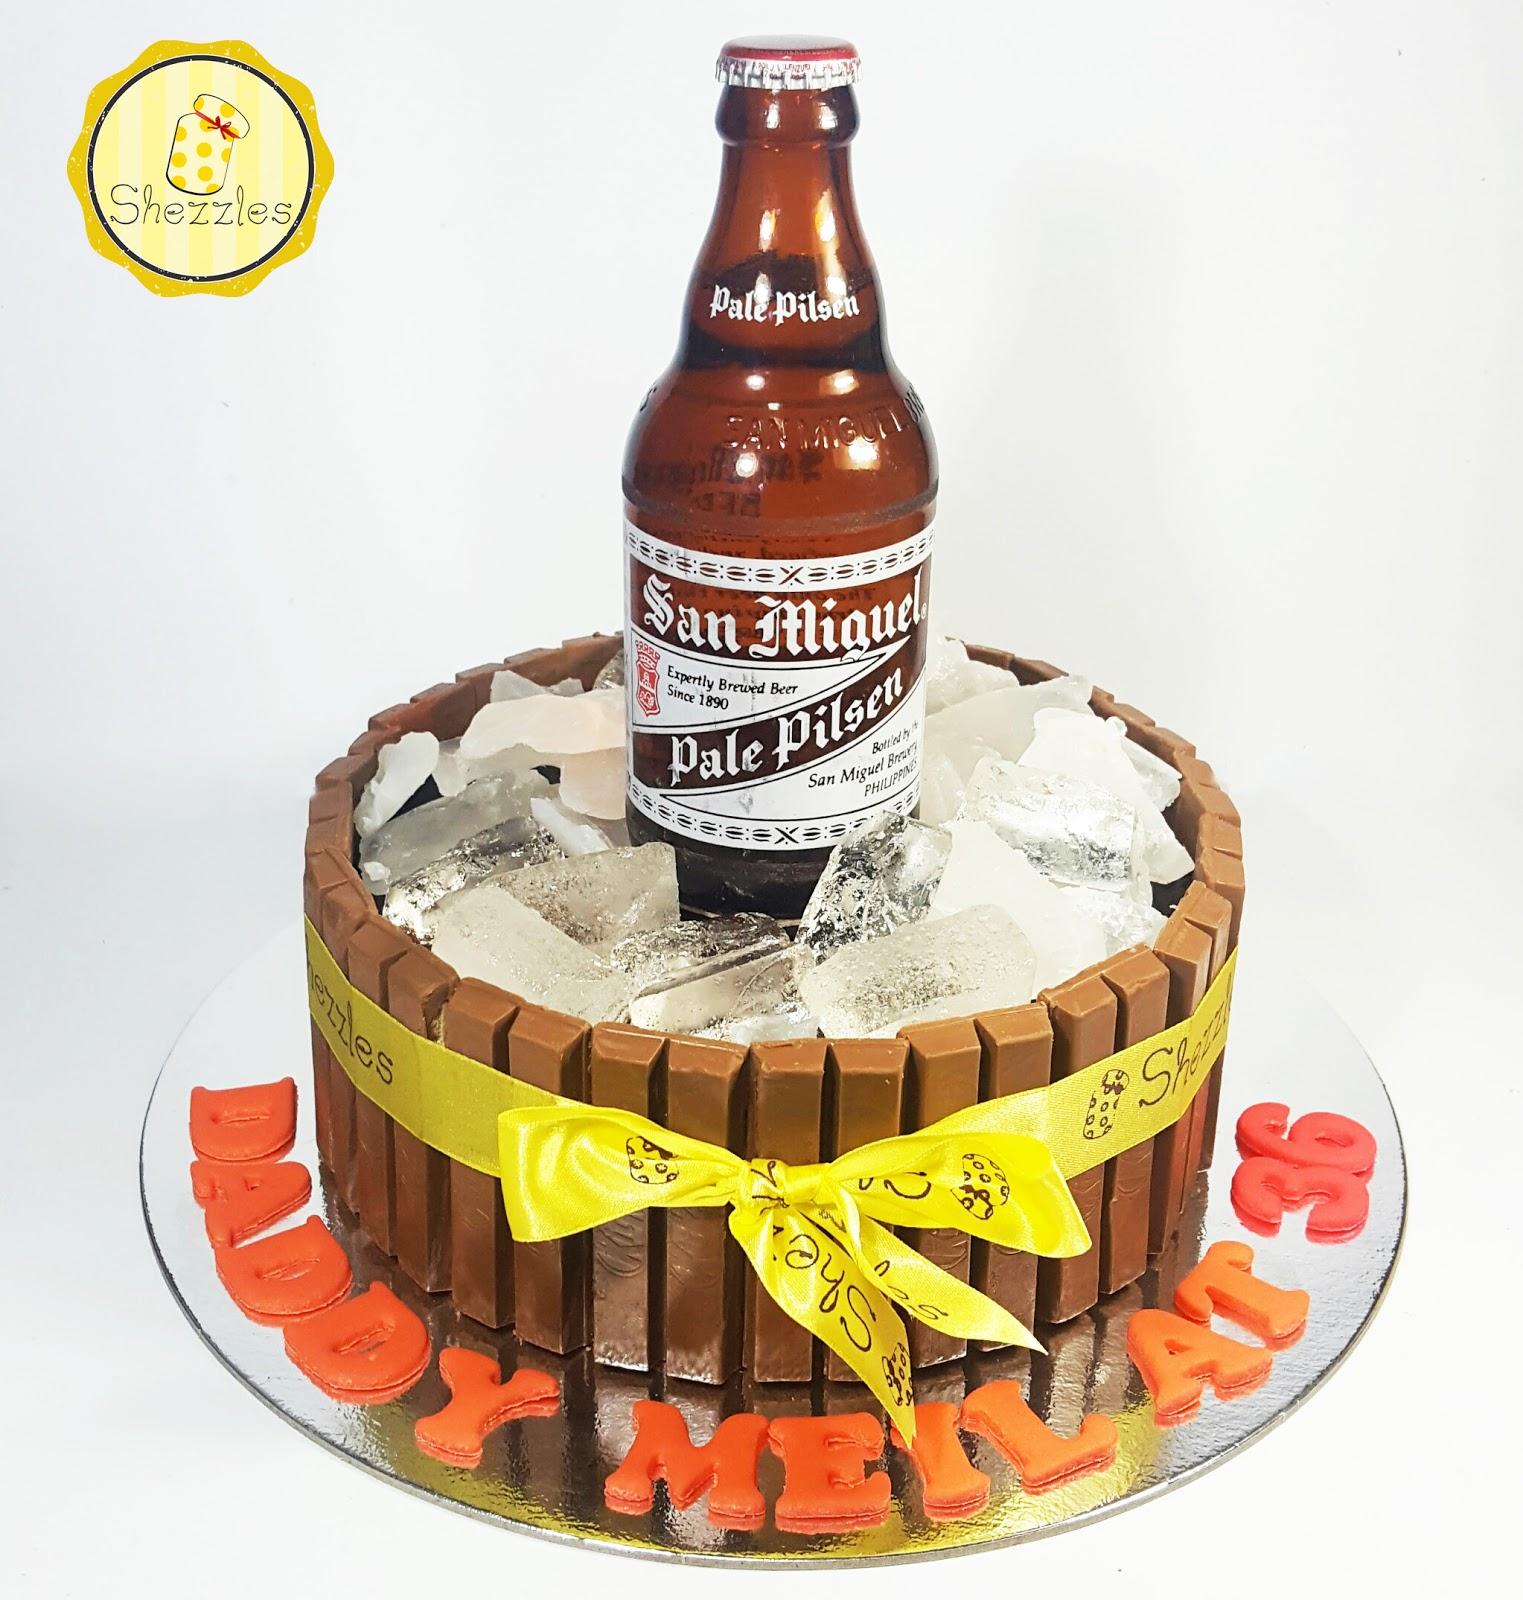 Dessert In A Jar: Kit Kat Beer Cake